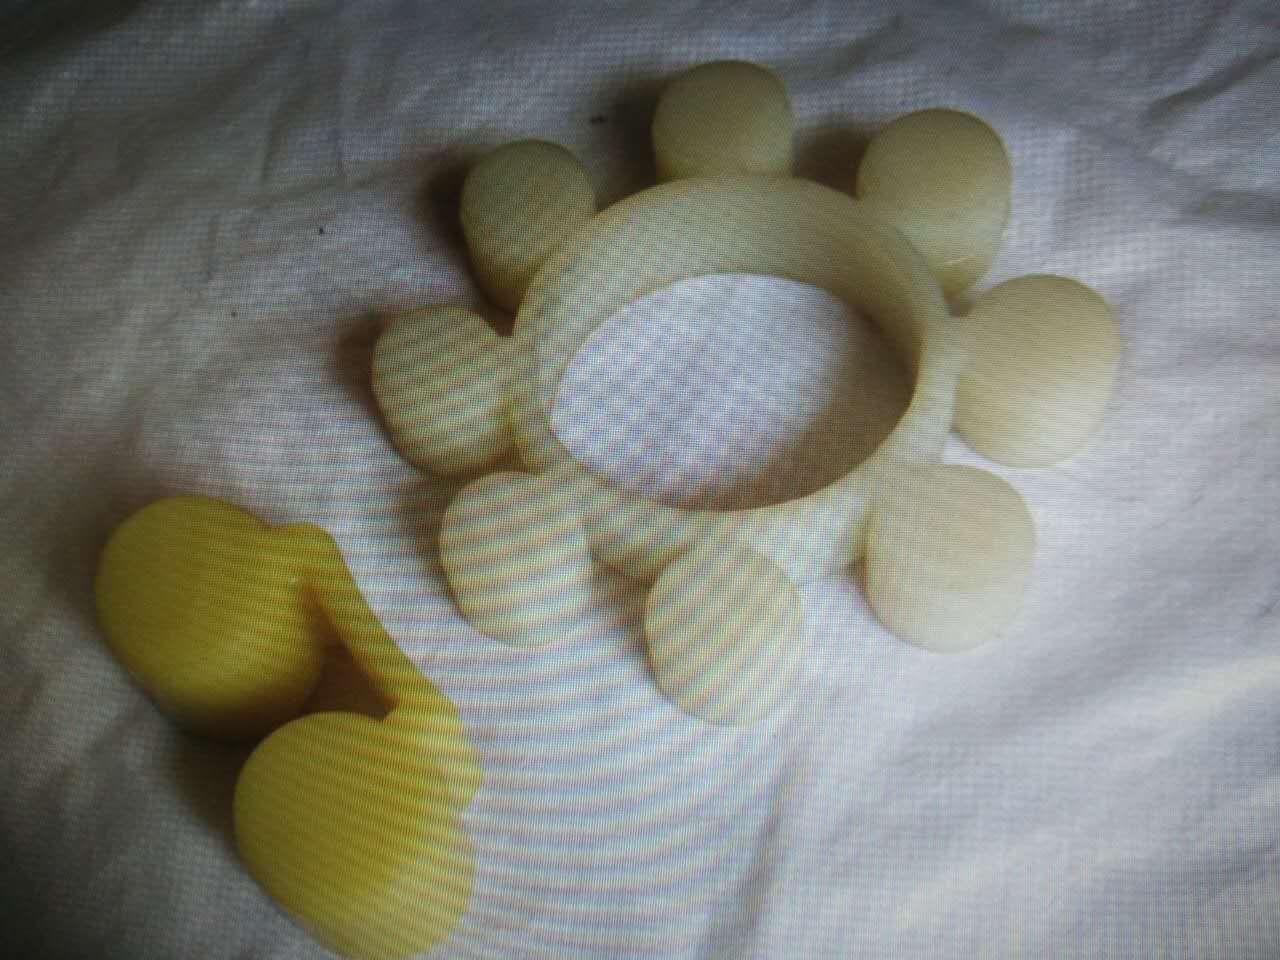 聚氨酯制品